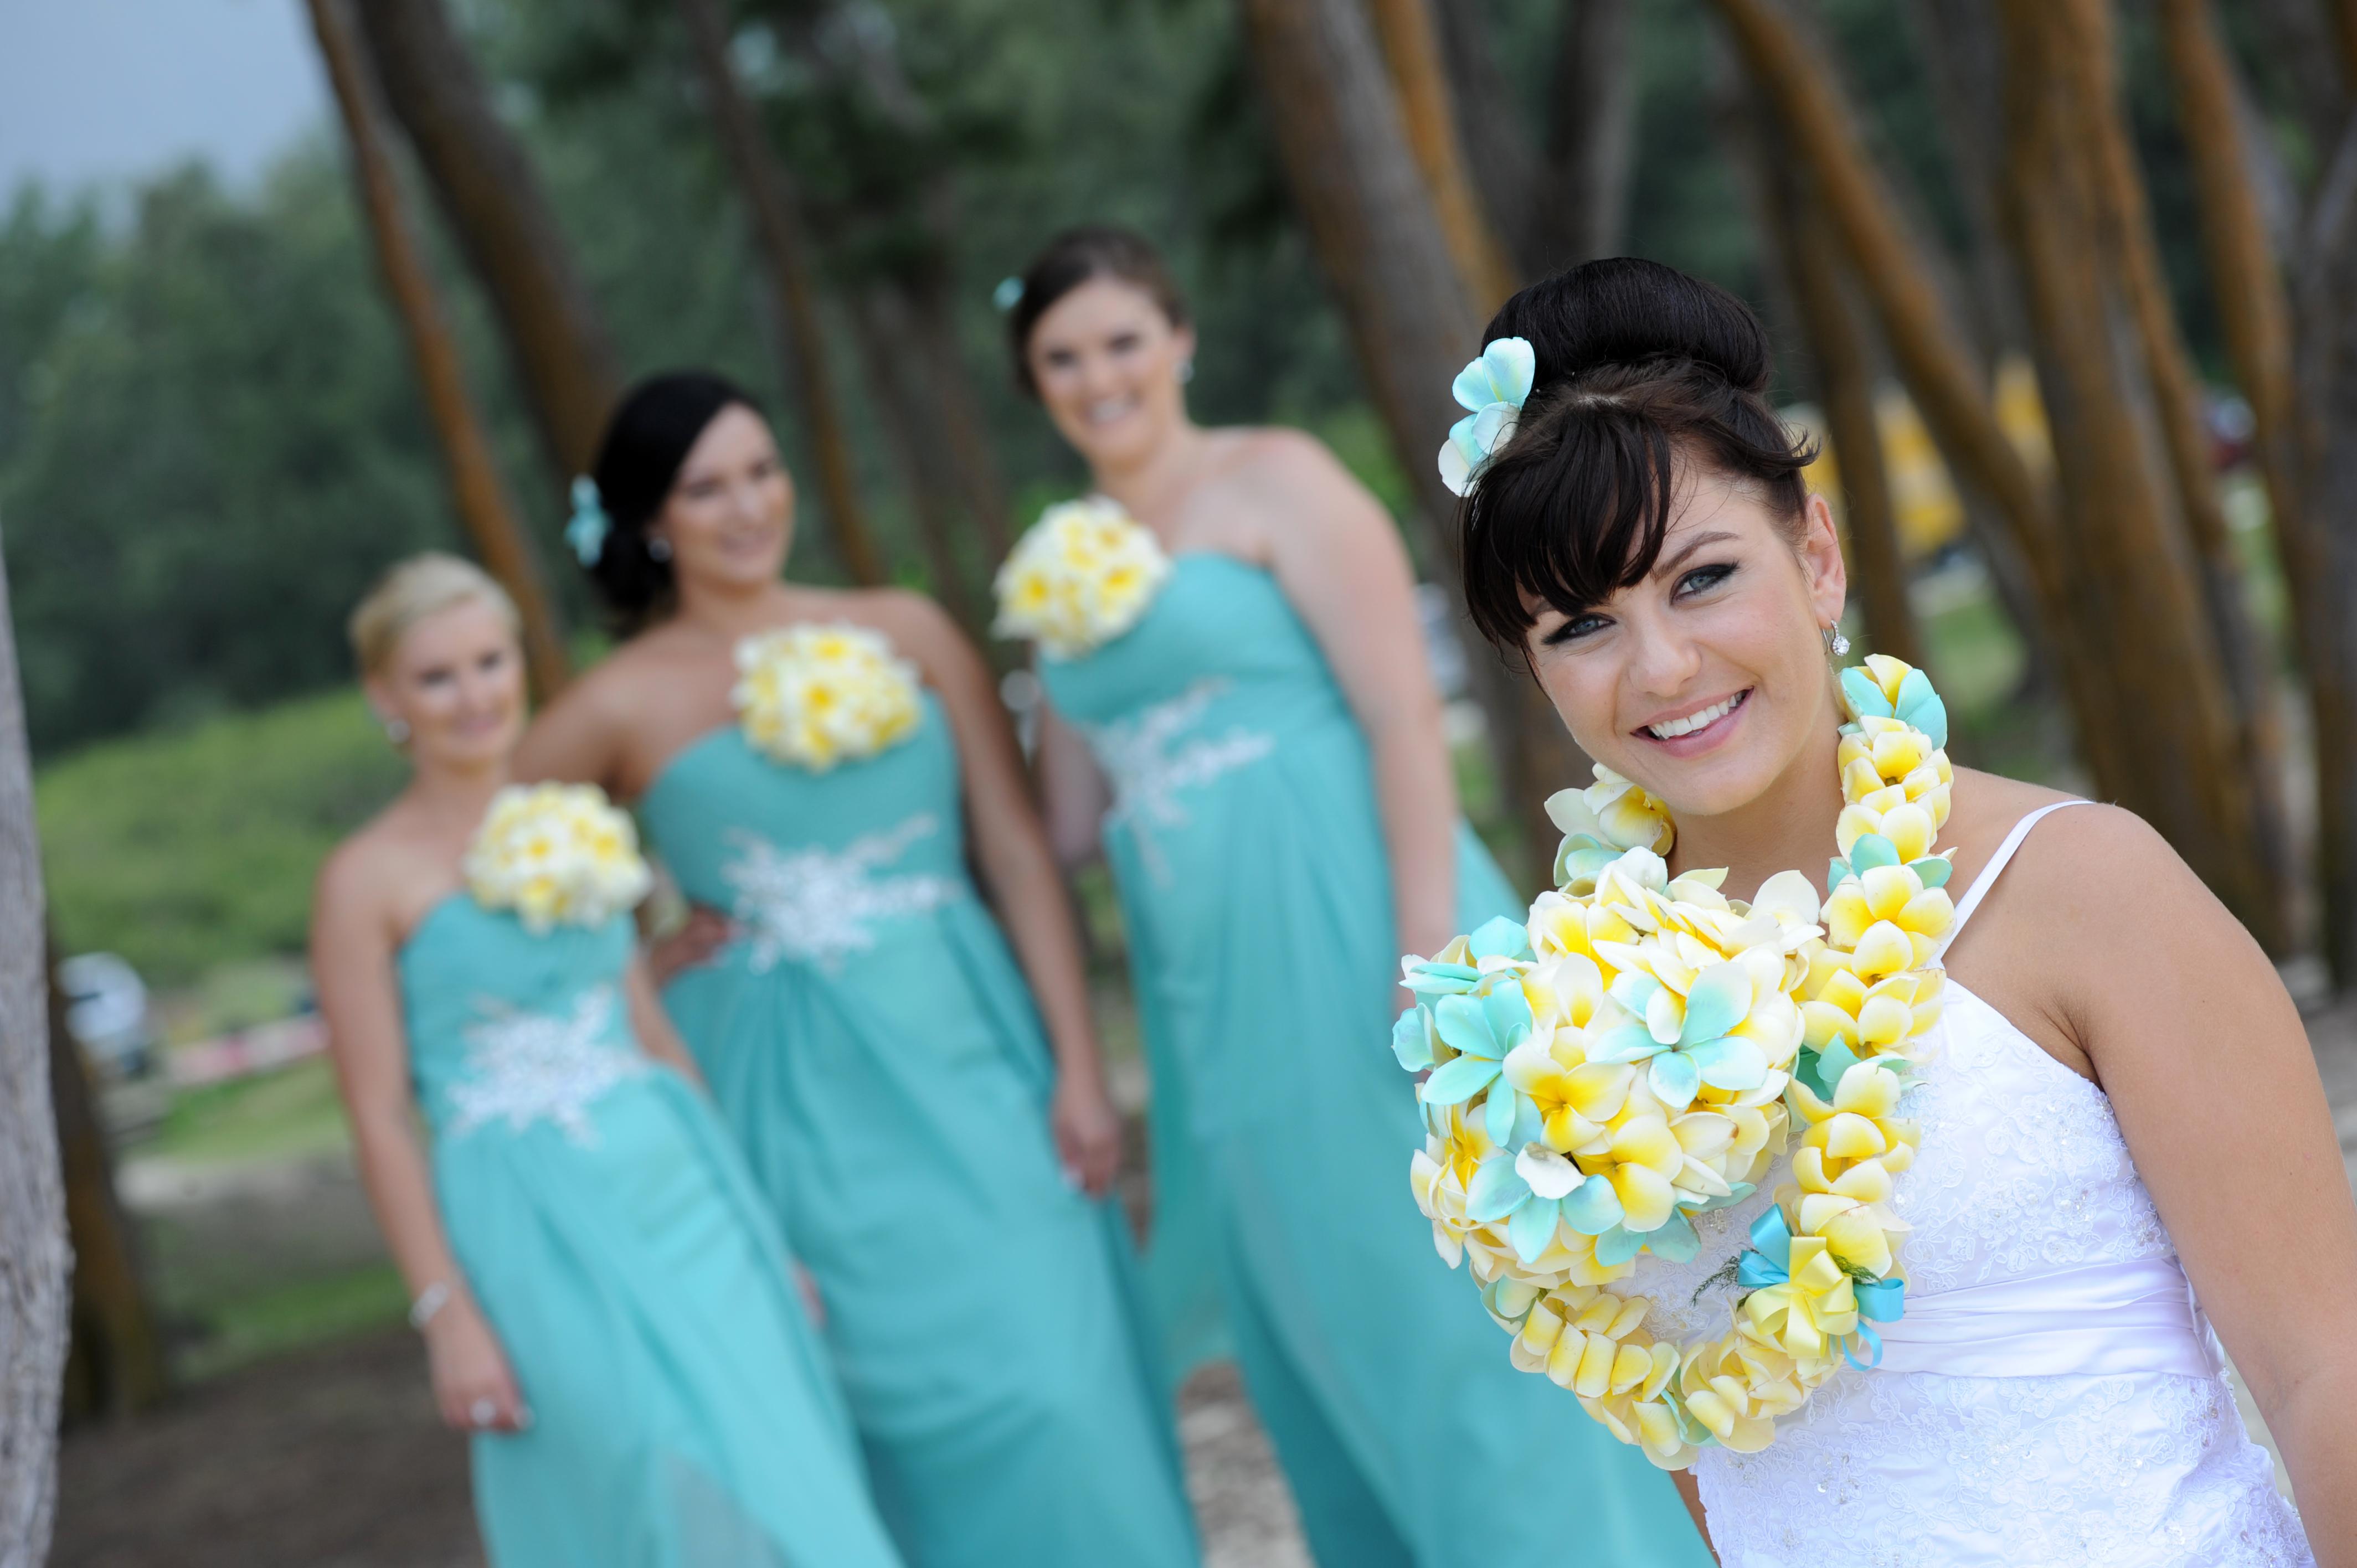 Alohaislandweddings.com- Wedding Picture in Hawaii-28